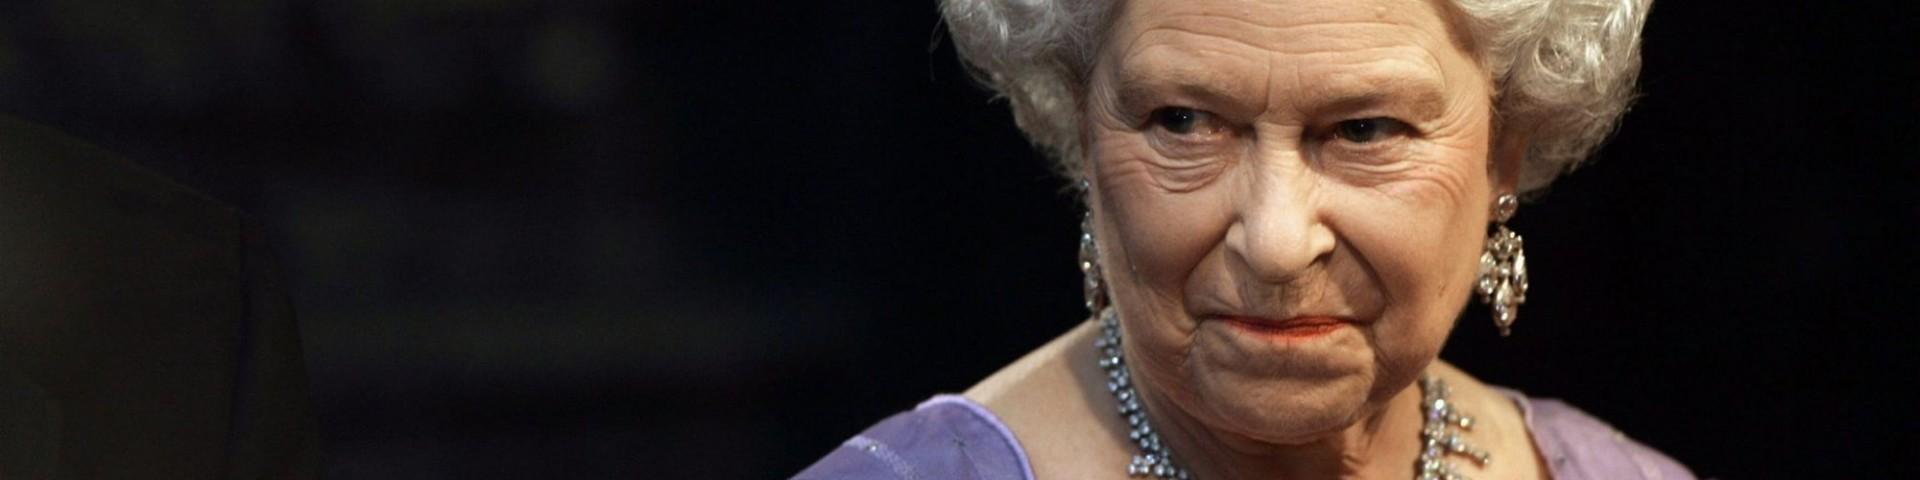 #RIPQueenElizabeth, la bufala della Regina Elisabetta morta diventa virale